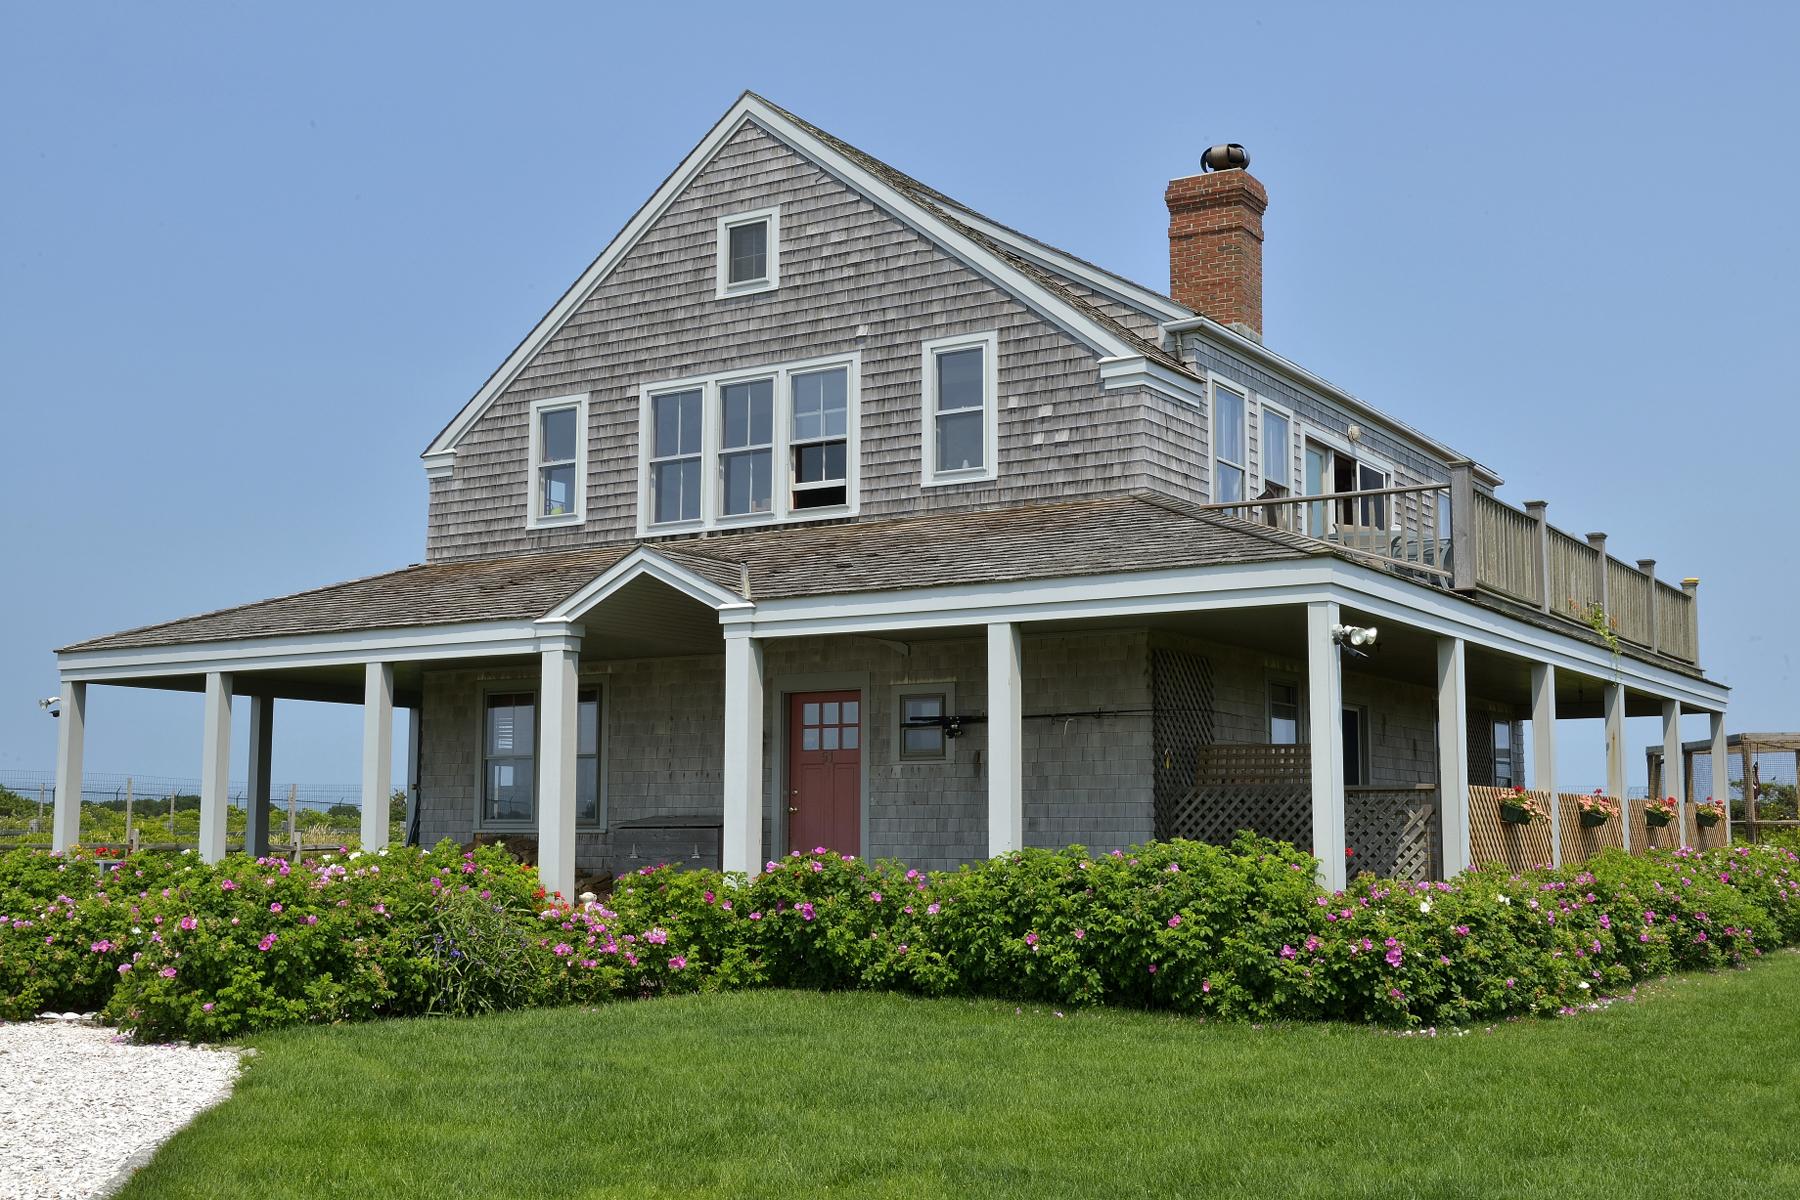 Casa Unifamiliar por un Venta en Magical Ocean Views 51 Madequecham Valley Road Nantucket, Massachusetts 02554 Estados Unidos